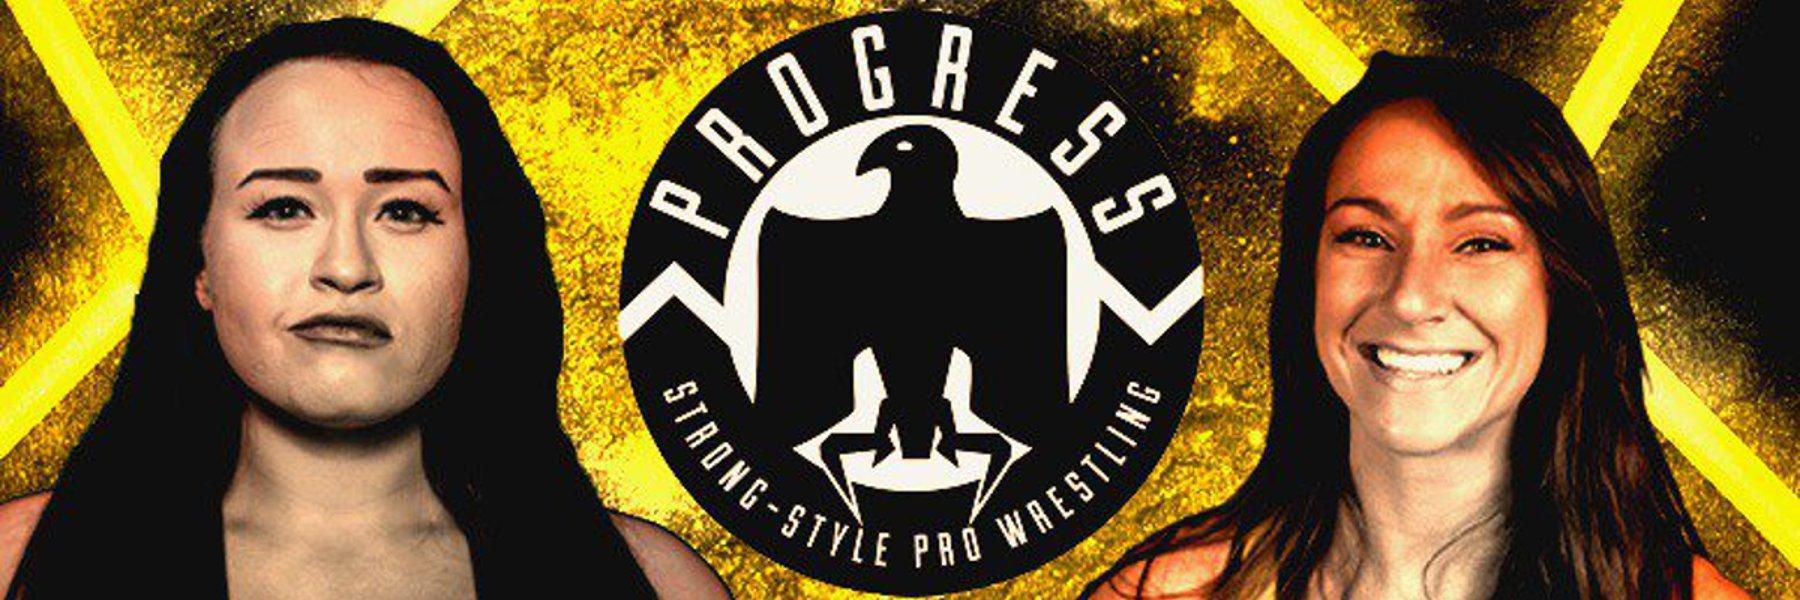 Jordynne Grace vs Kylie Rae - PROGRESS Title Match at Warrior Wrestling